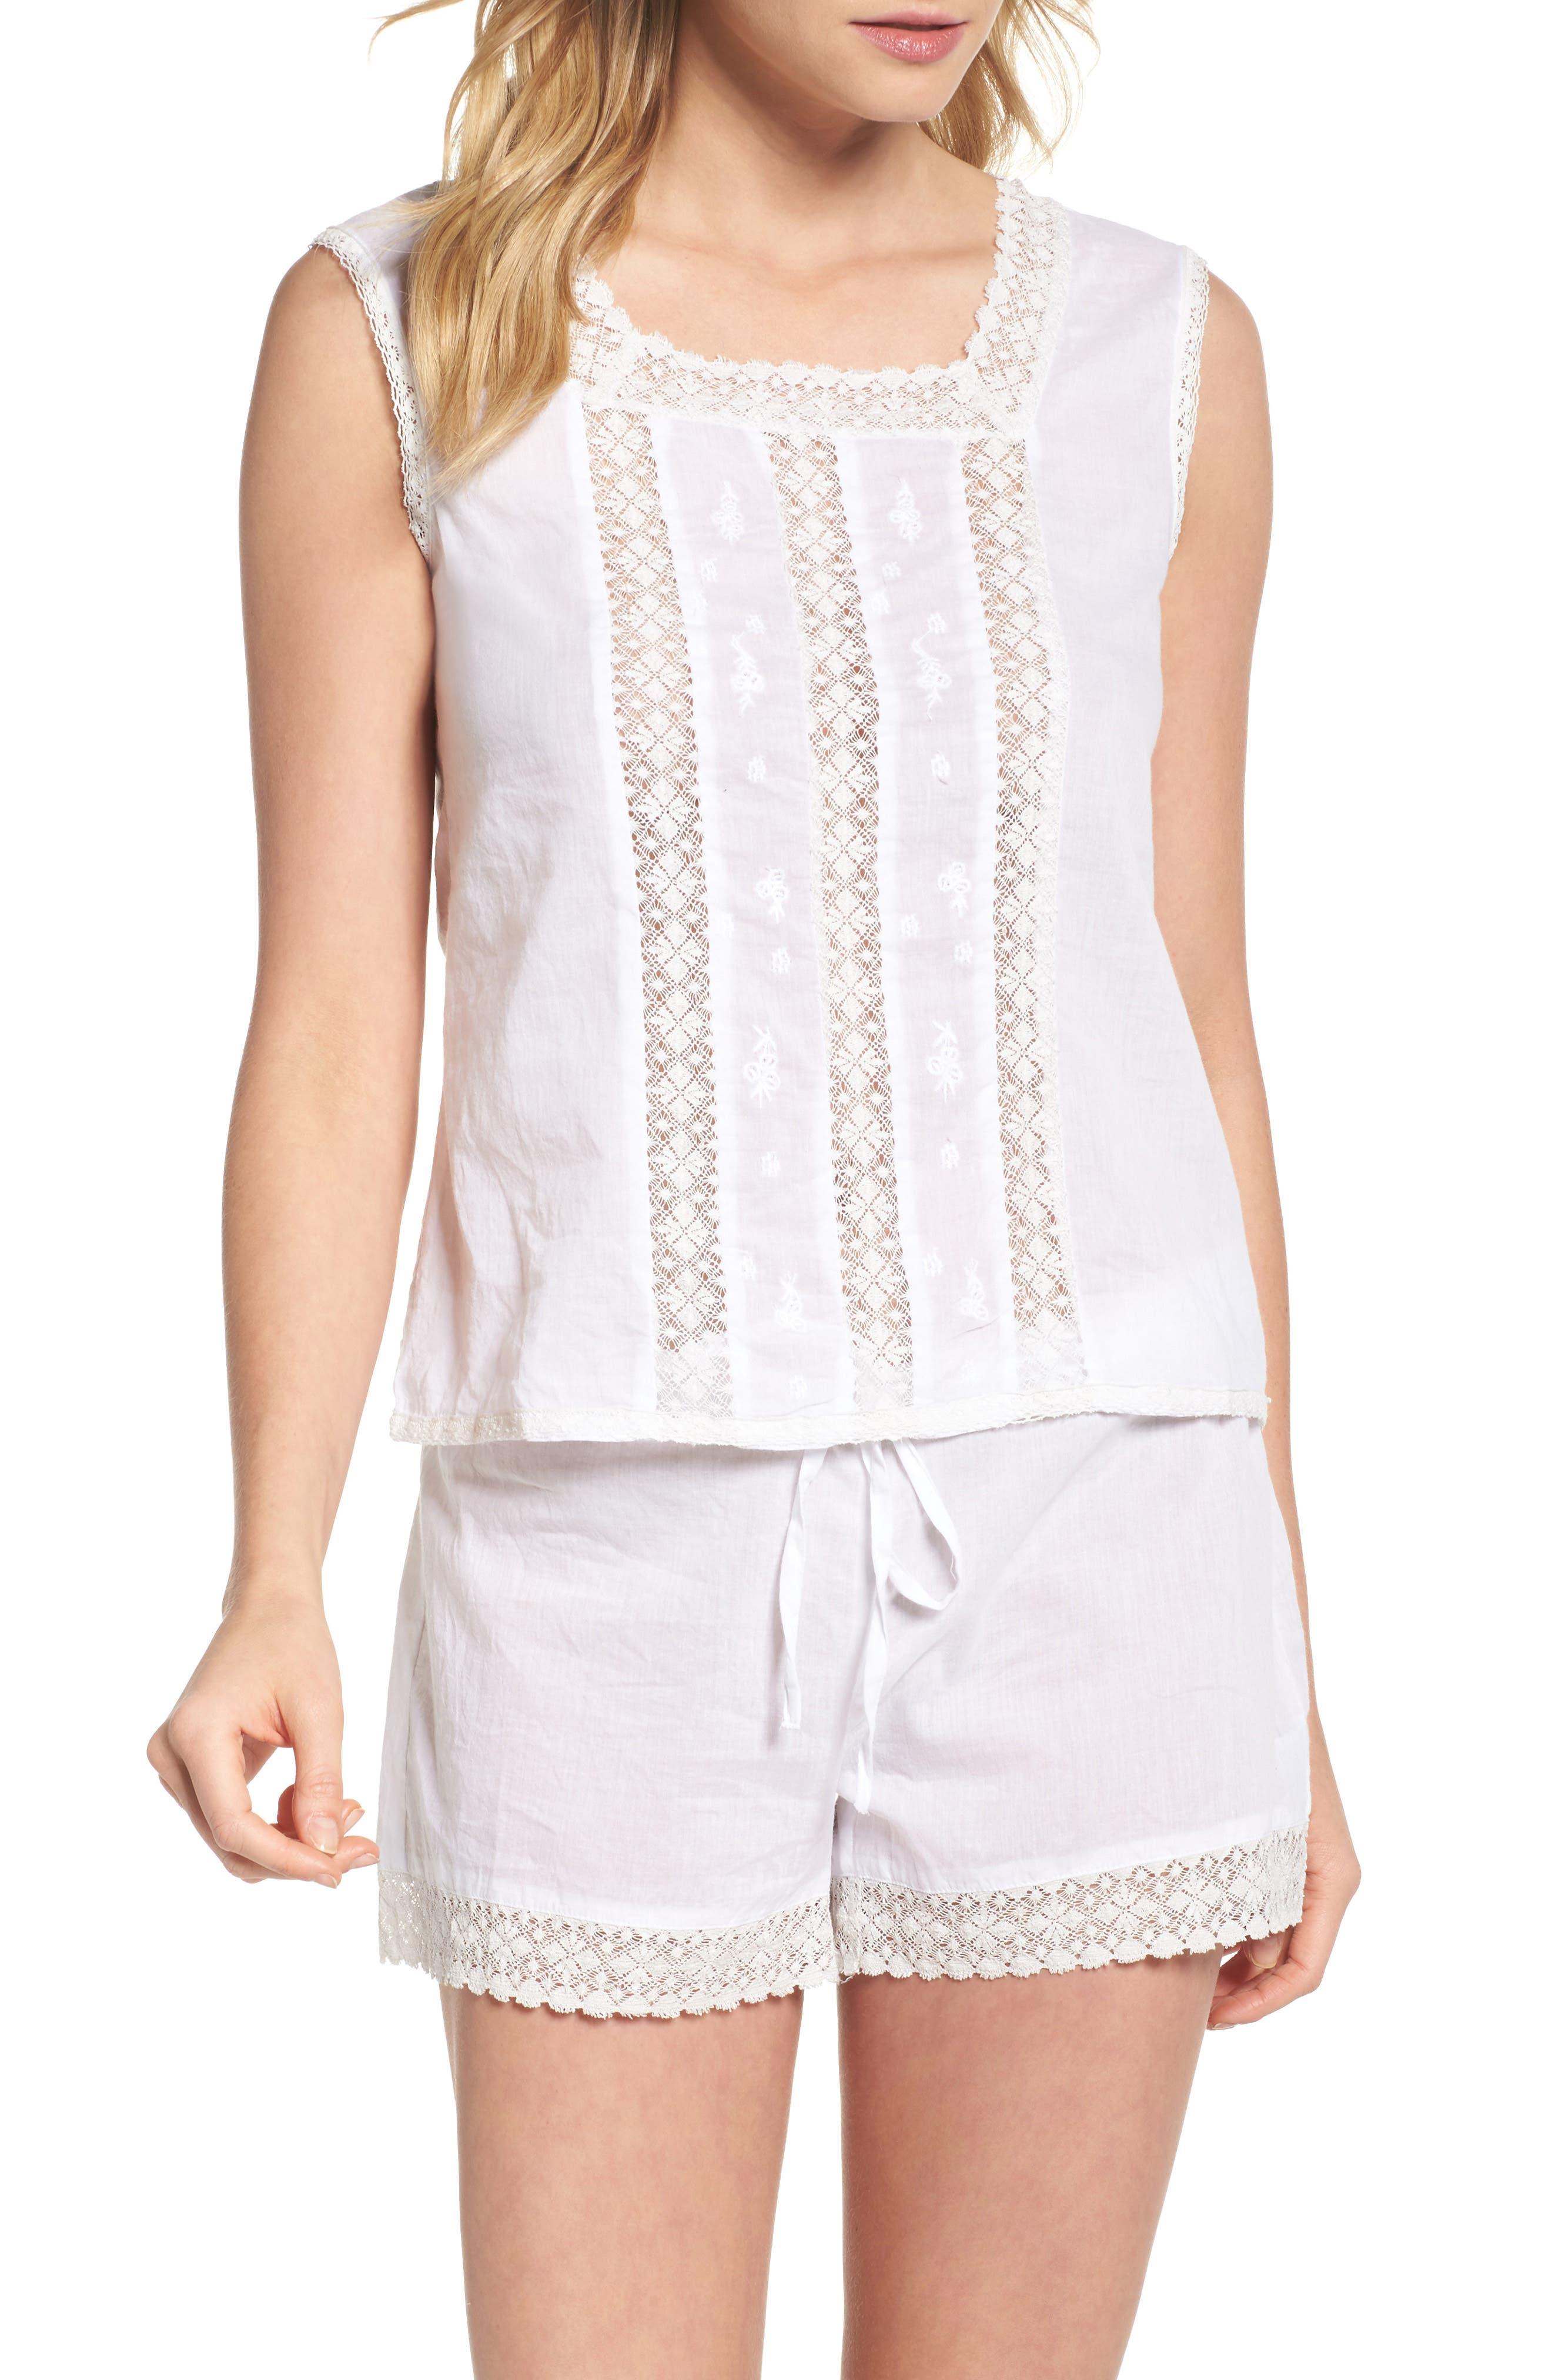 Lace Trim Sleep Shorts,                             Alternate thumbnail 5, color,                             White